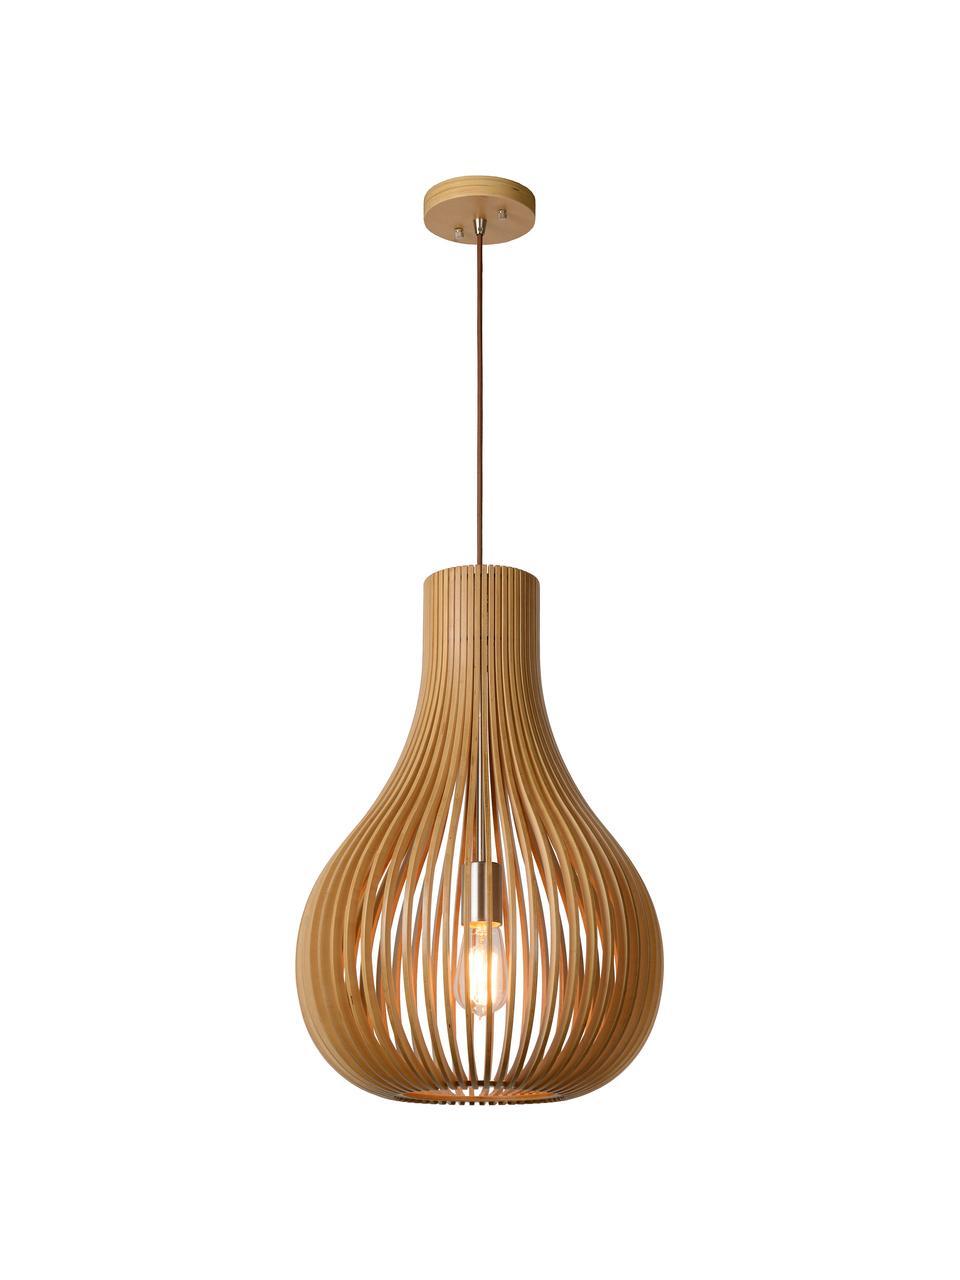 Pendelleuchte Bodo aus Holz, Lampenschirm: Holz, Baldachin: Holz, Braun, Ø 38 x H 55 cm